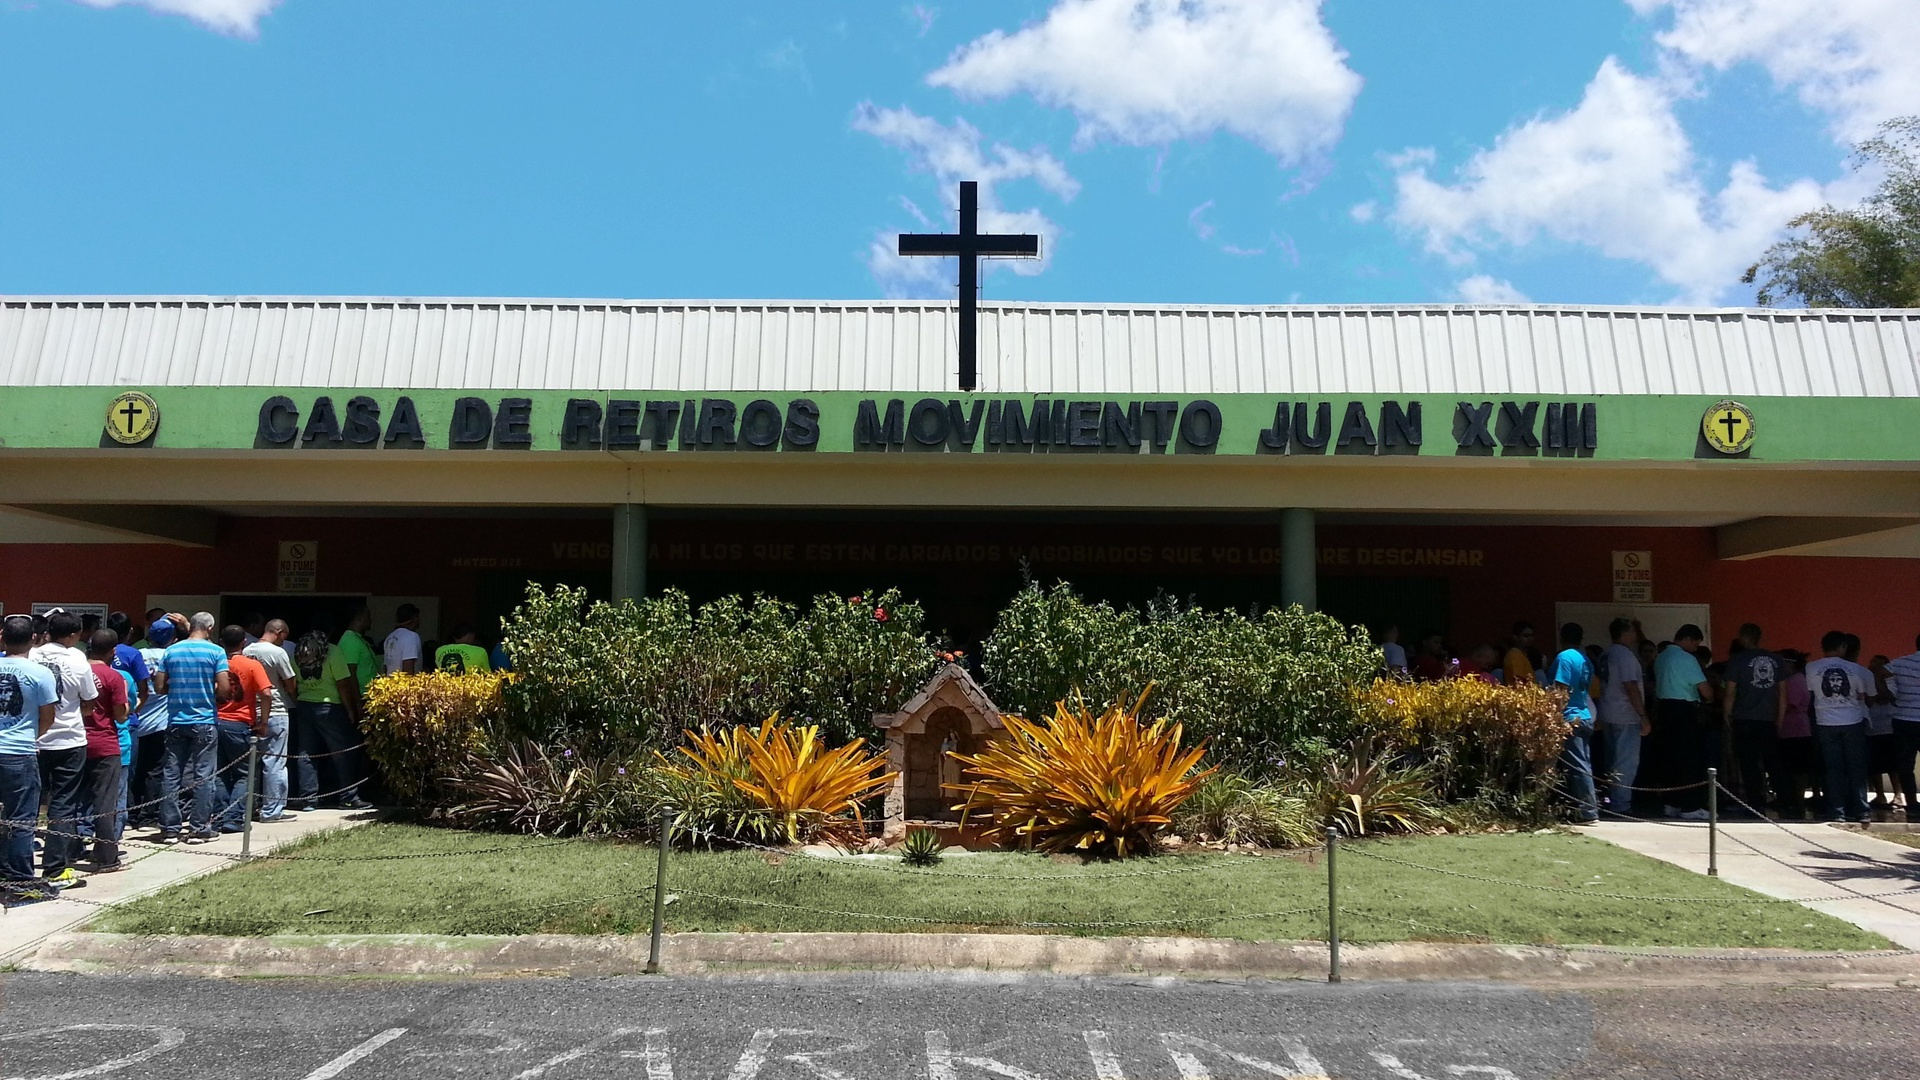 CASA RETIRO BEATO JUAN XXIII , Carretera 4417 Km. 1.0 Barrio Mamey, Aguada, , Puerto Rico , 00602, Puerto Rico